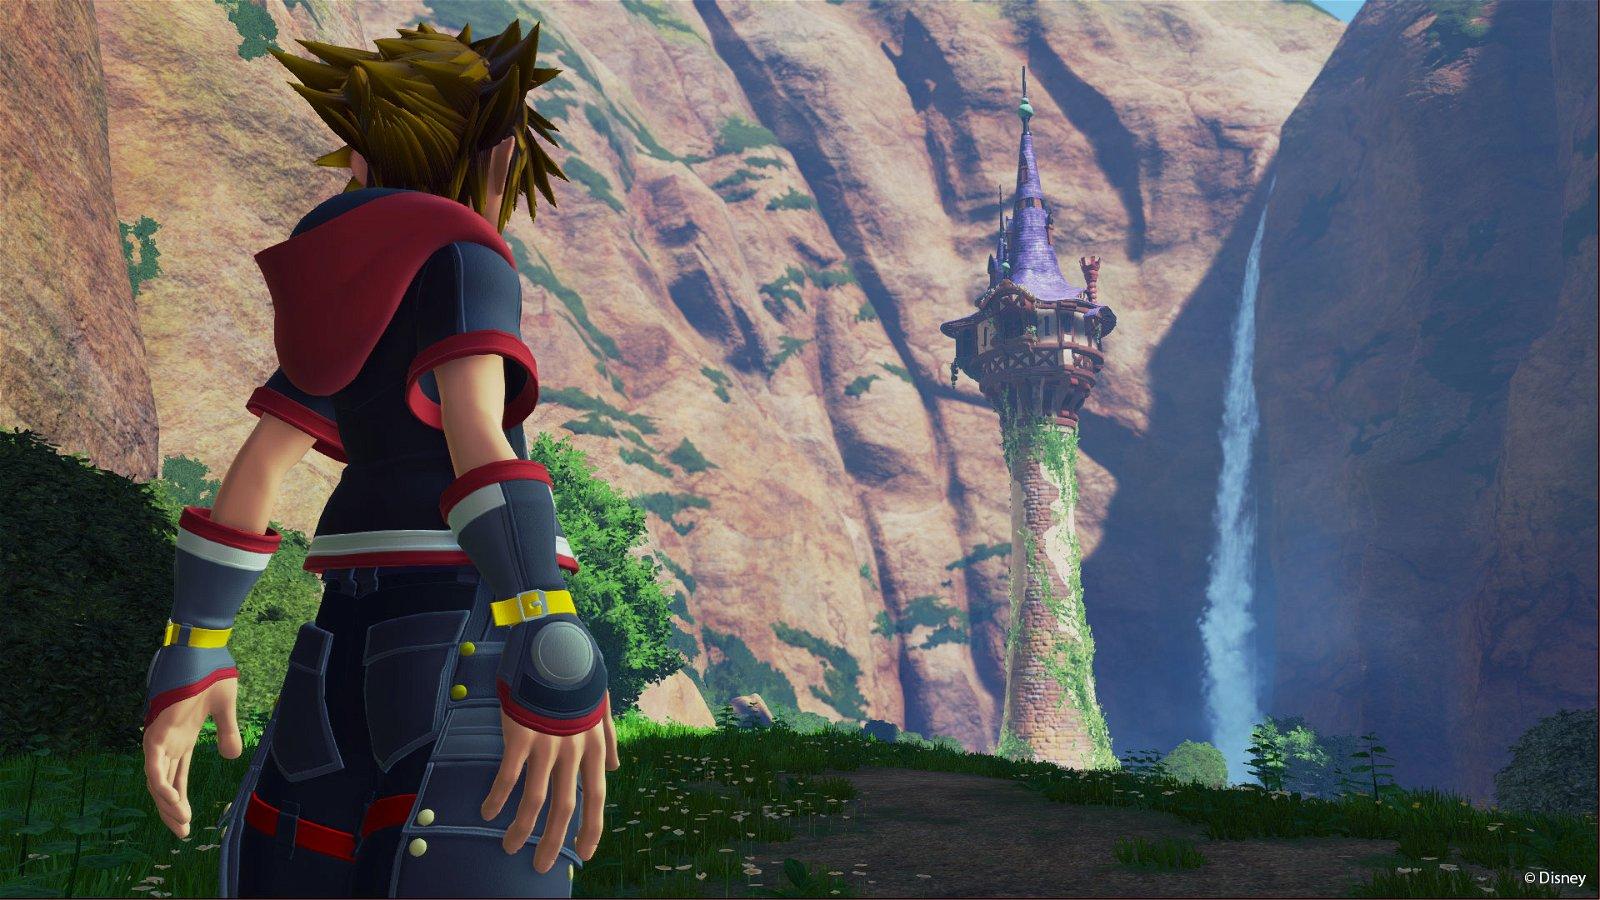 Kingdom Hearts III and Final Fantasy VII Remake Delayed 1